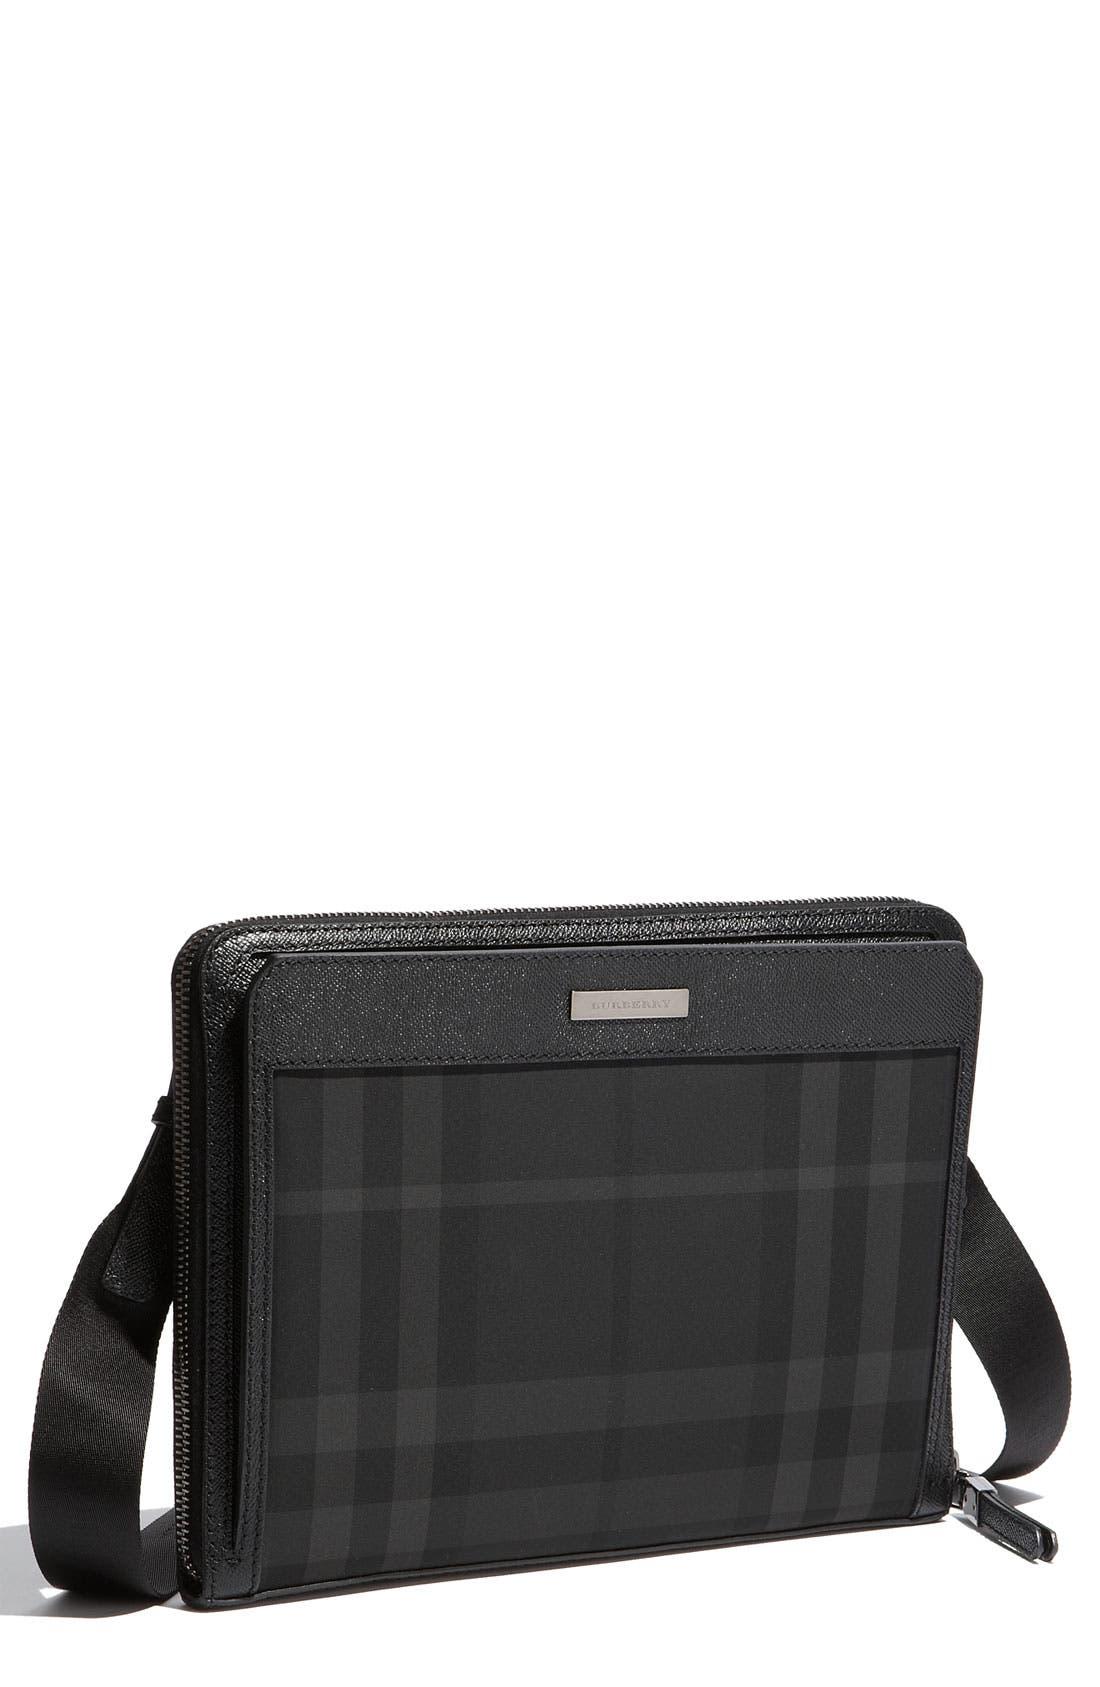 Alternate Image 1 Selected - Burberry Check Print Crossbody Bag